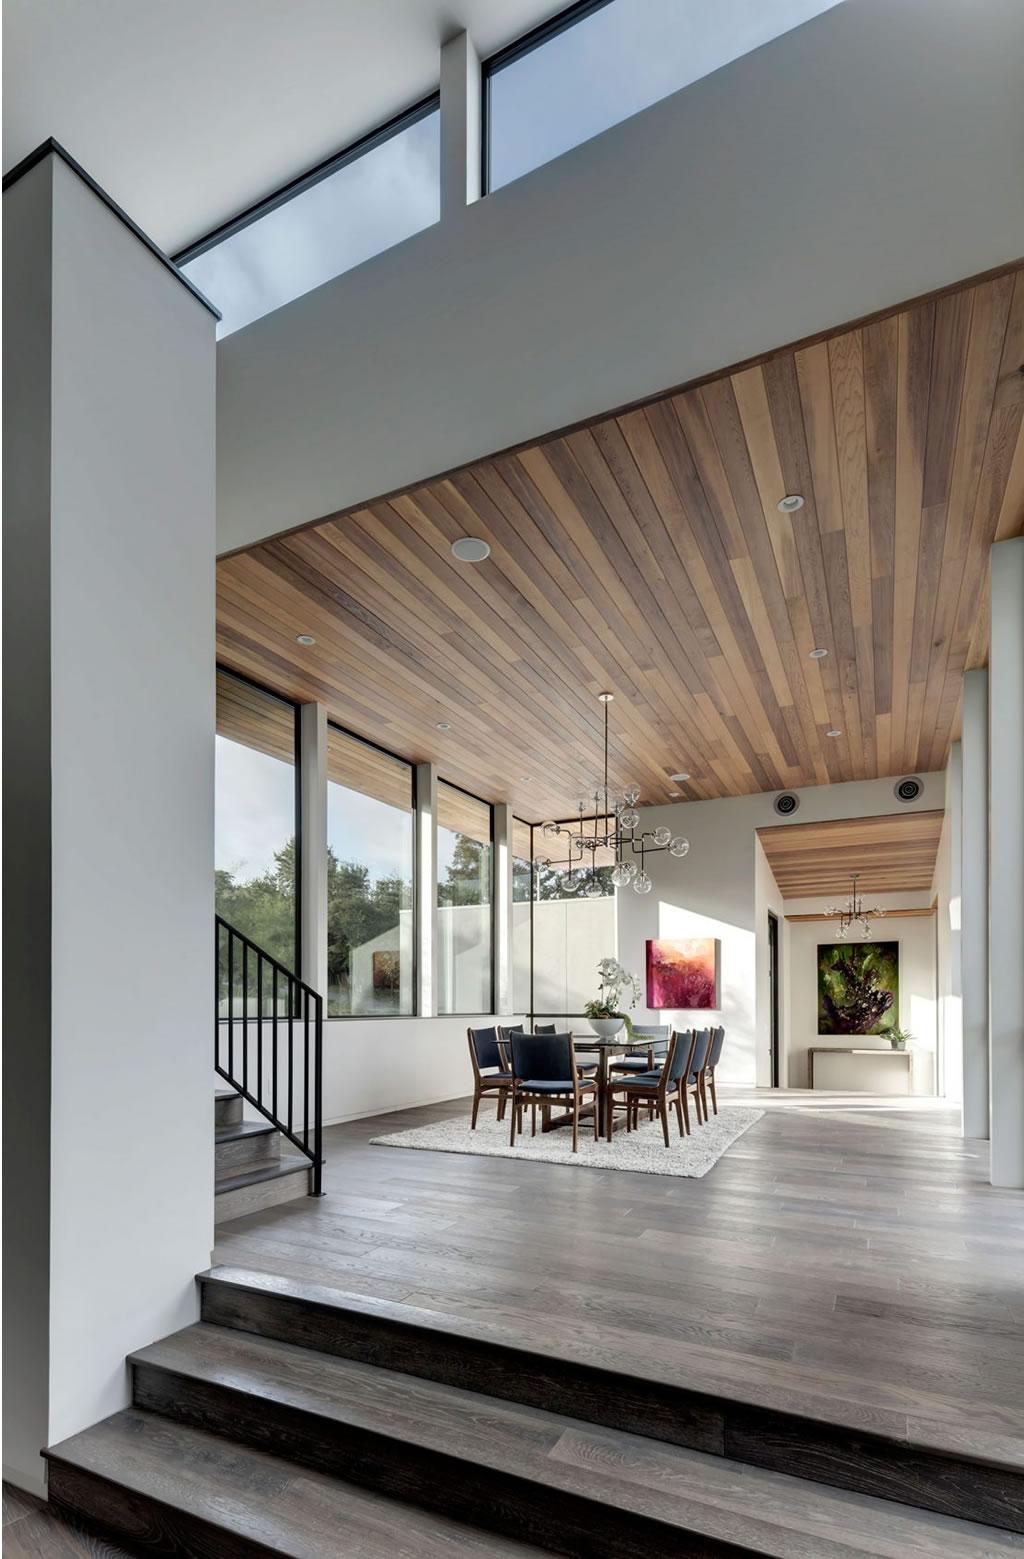 Splendid Home In Austin, Texas By Matt Fajkus Architecture 9